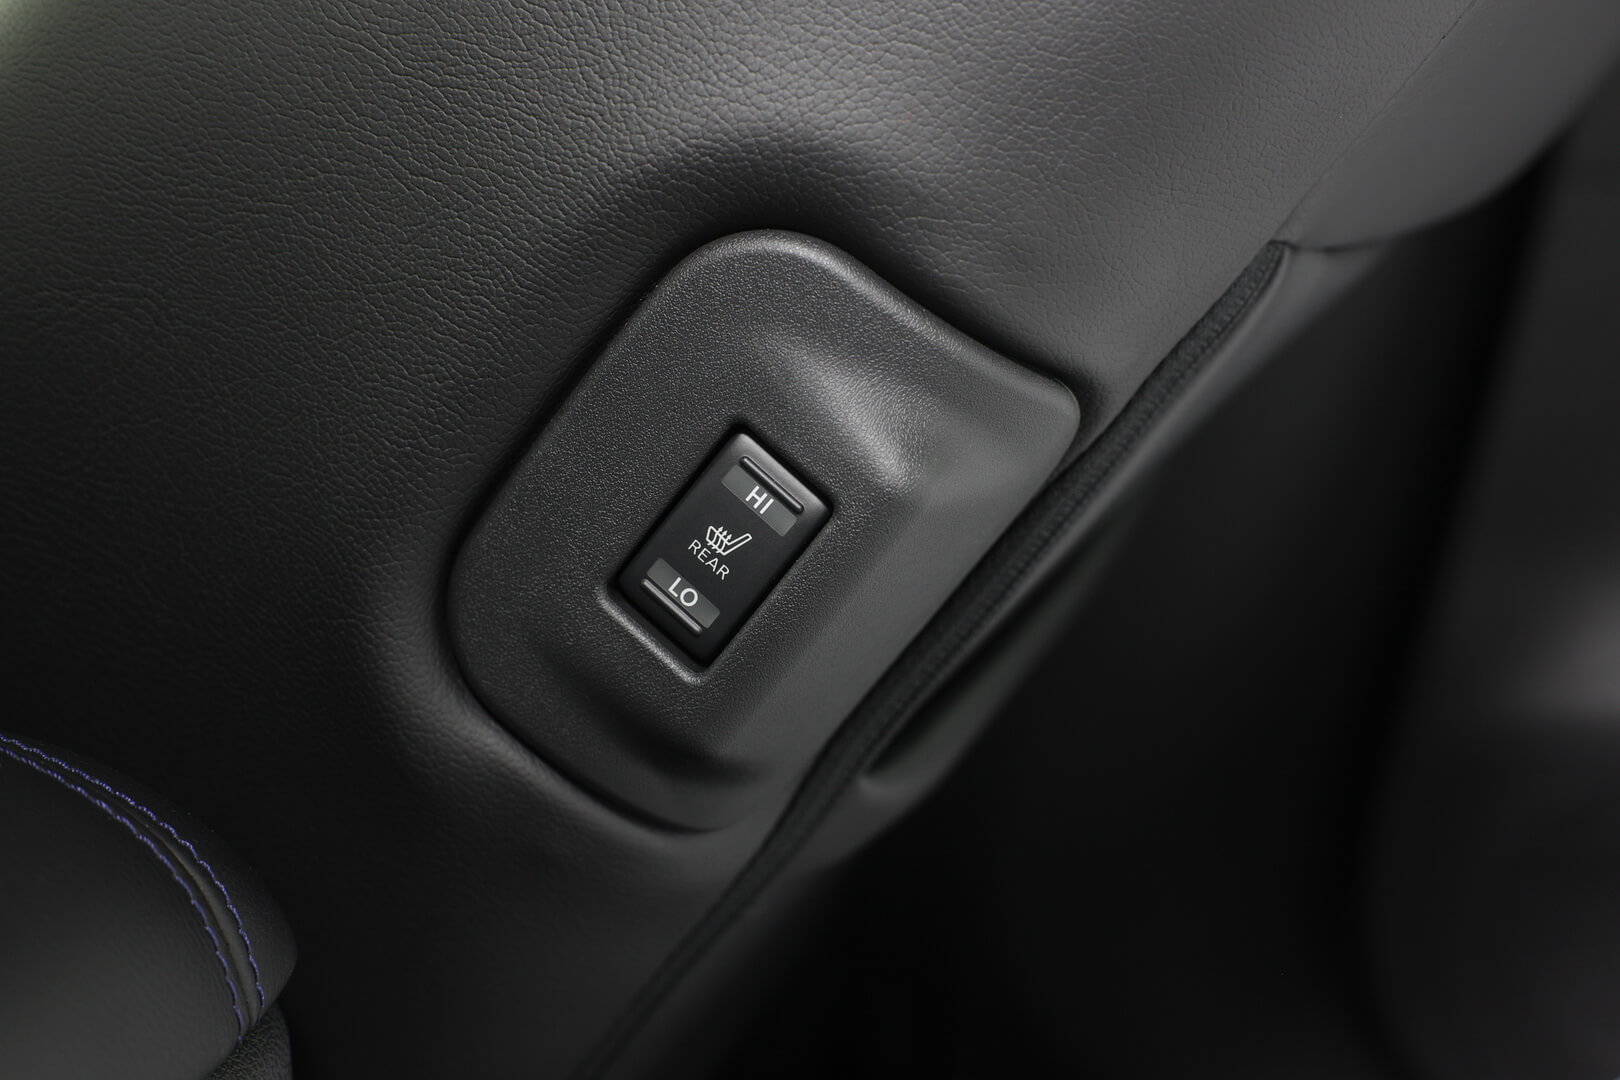 Фотография экоавто Nissan Leaf 2013 (24 кВт•ч) - фото 34